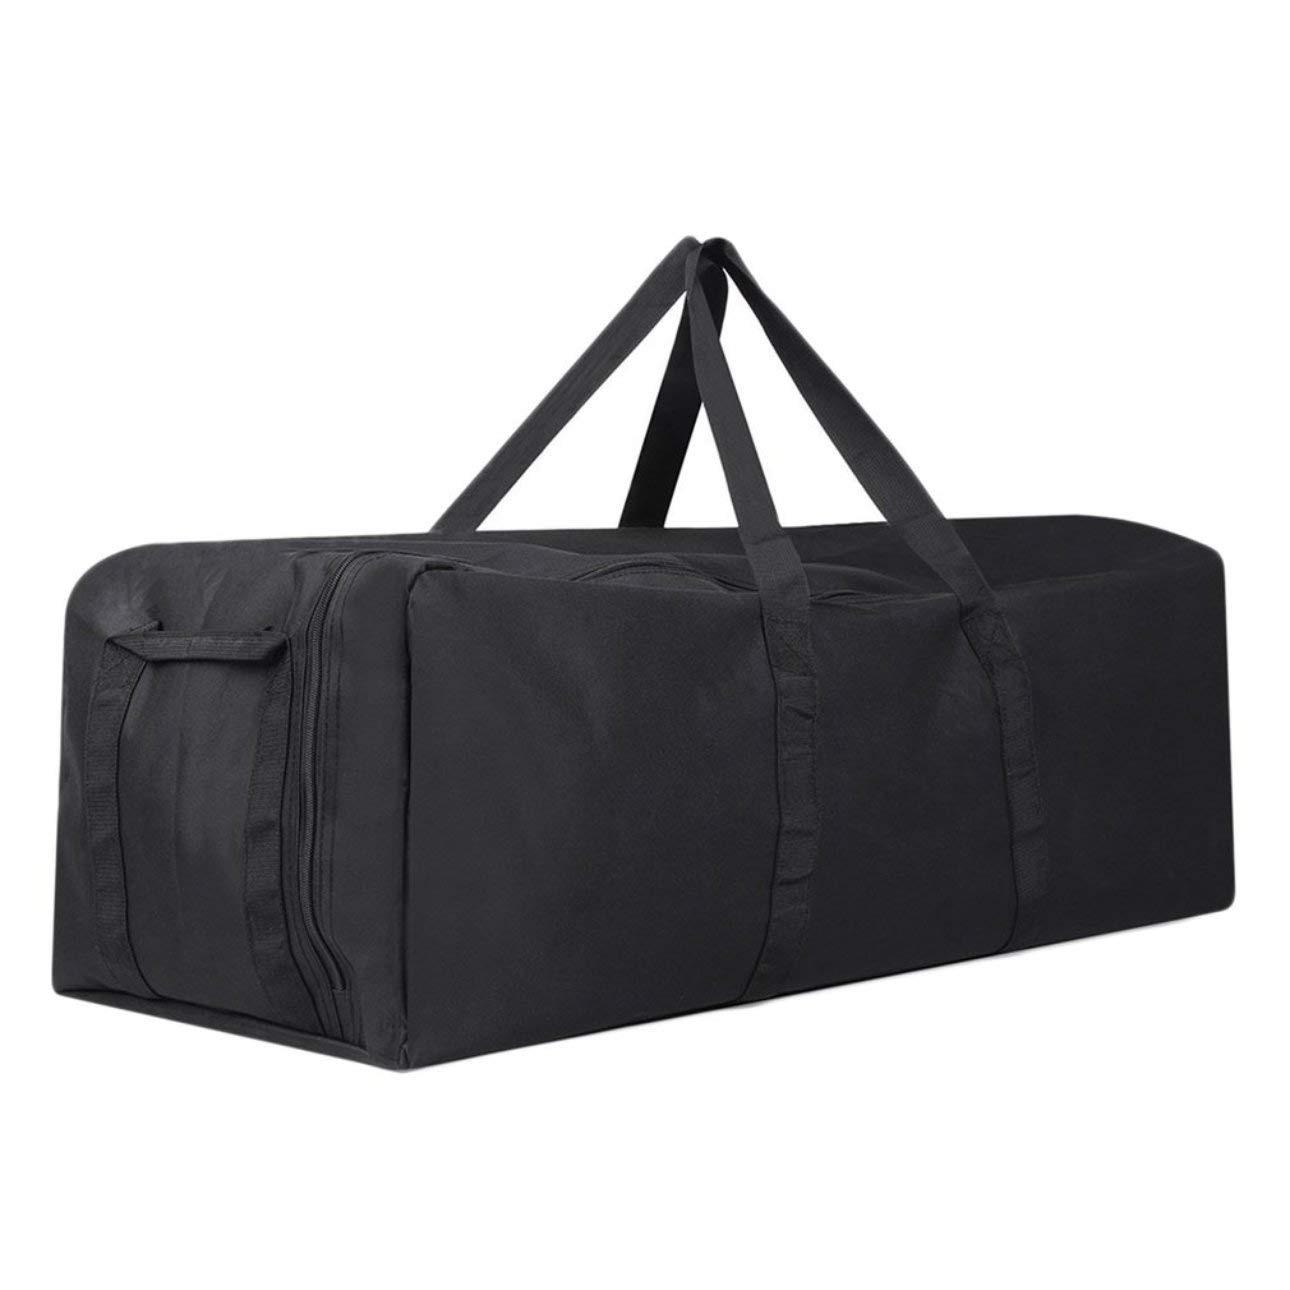 Large Hiking Backpacks Travel Duffel Bag Multifunction Sports Bag 100L Capacity Polyester Foldable Ourdoor Bag Travel Backpack